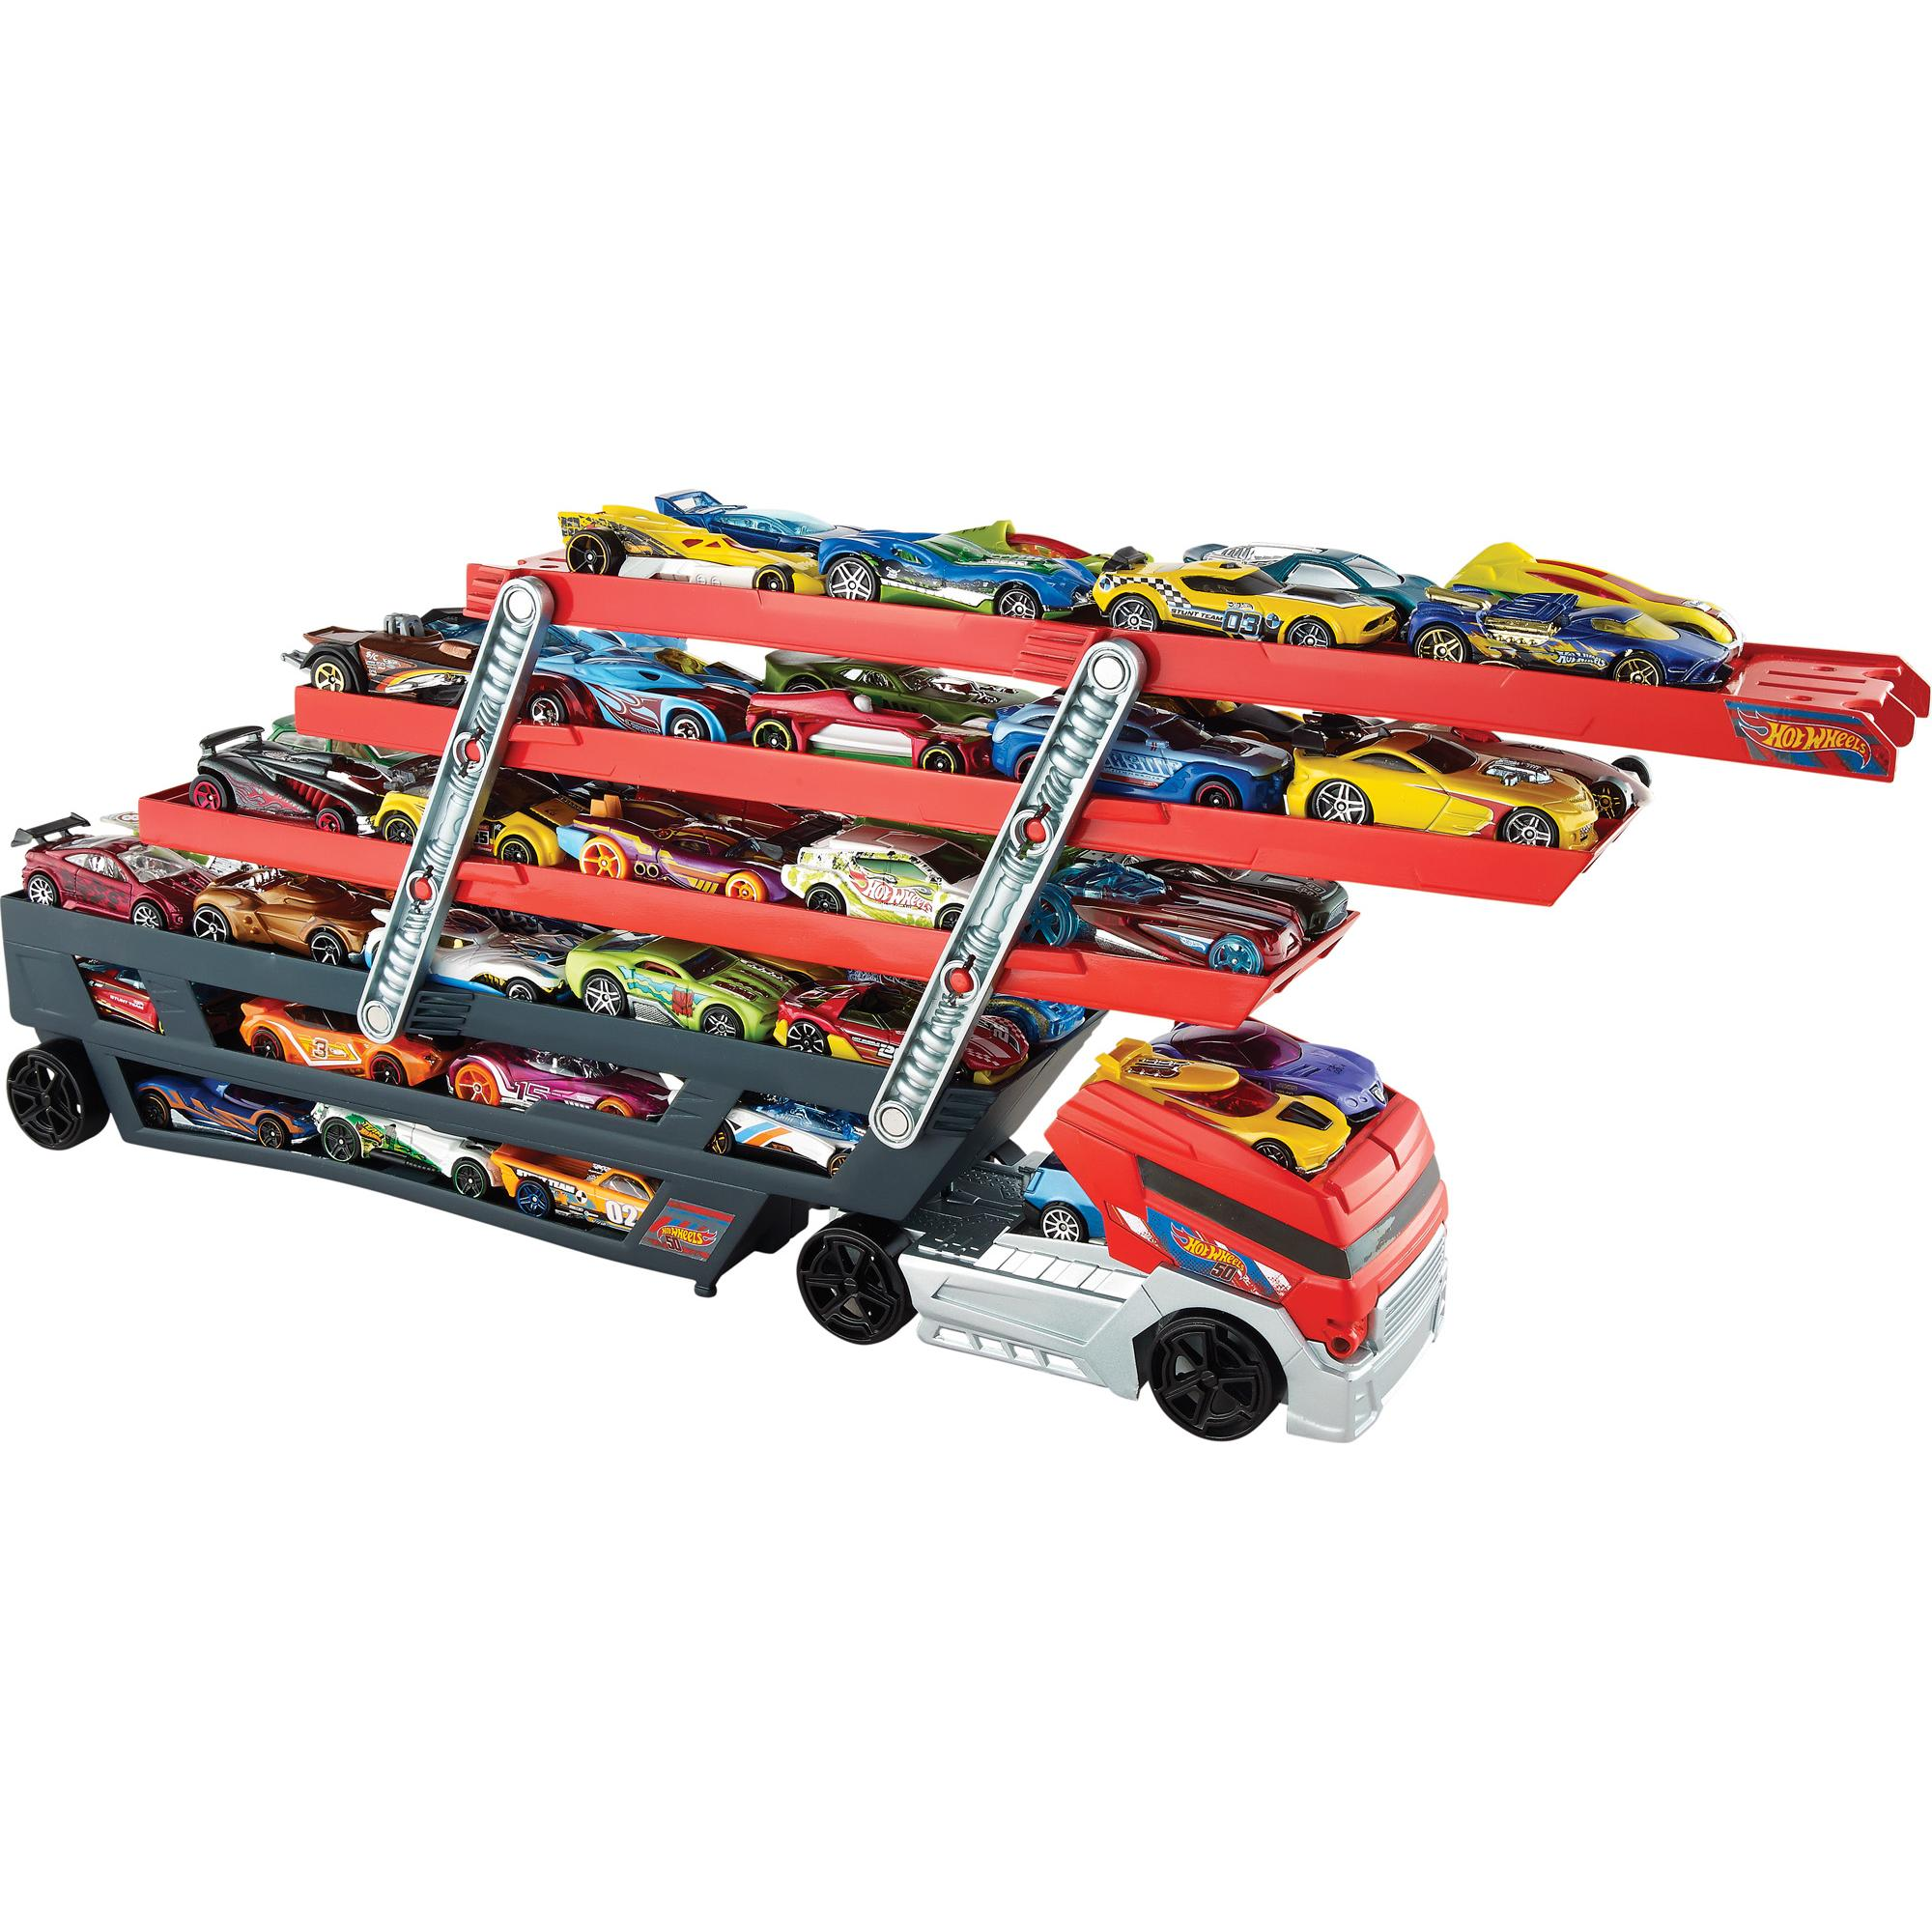 Hot Wheels clipart vehicle Hot Truck Hauler Mega Wheels